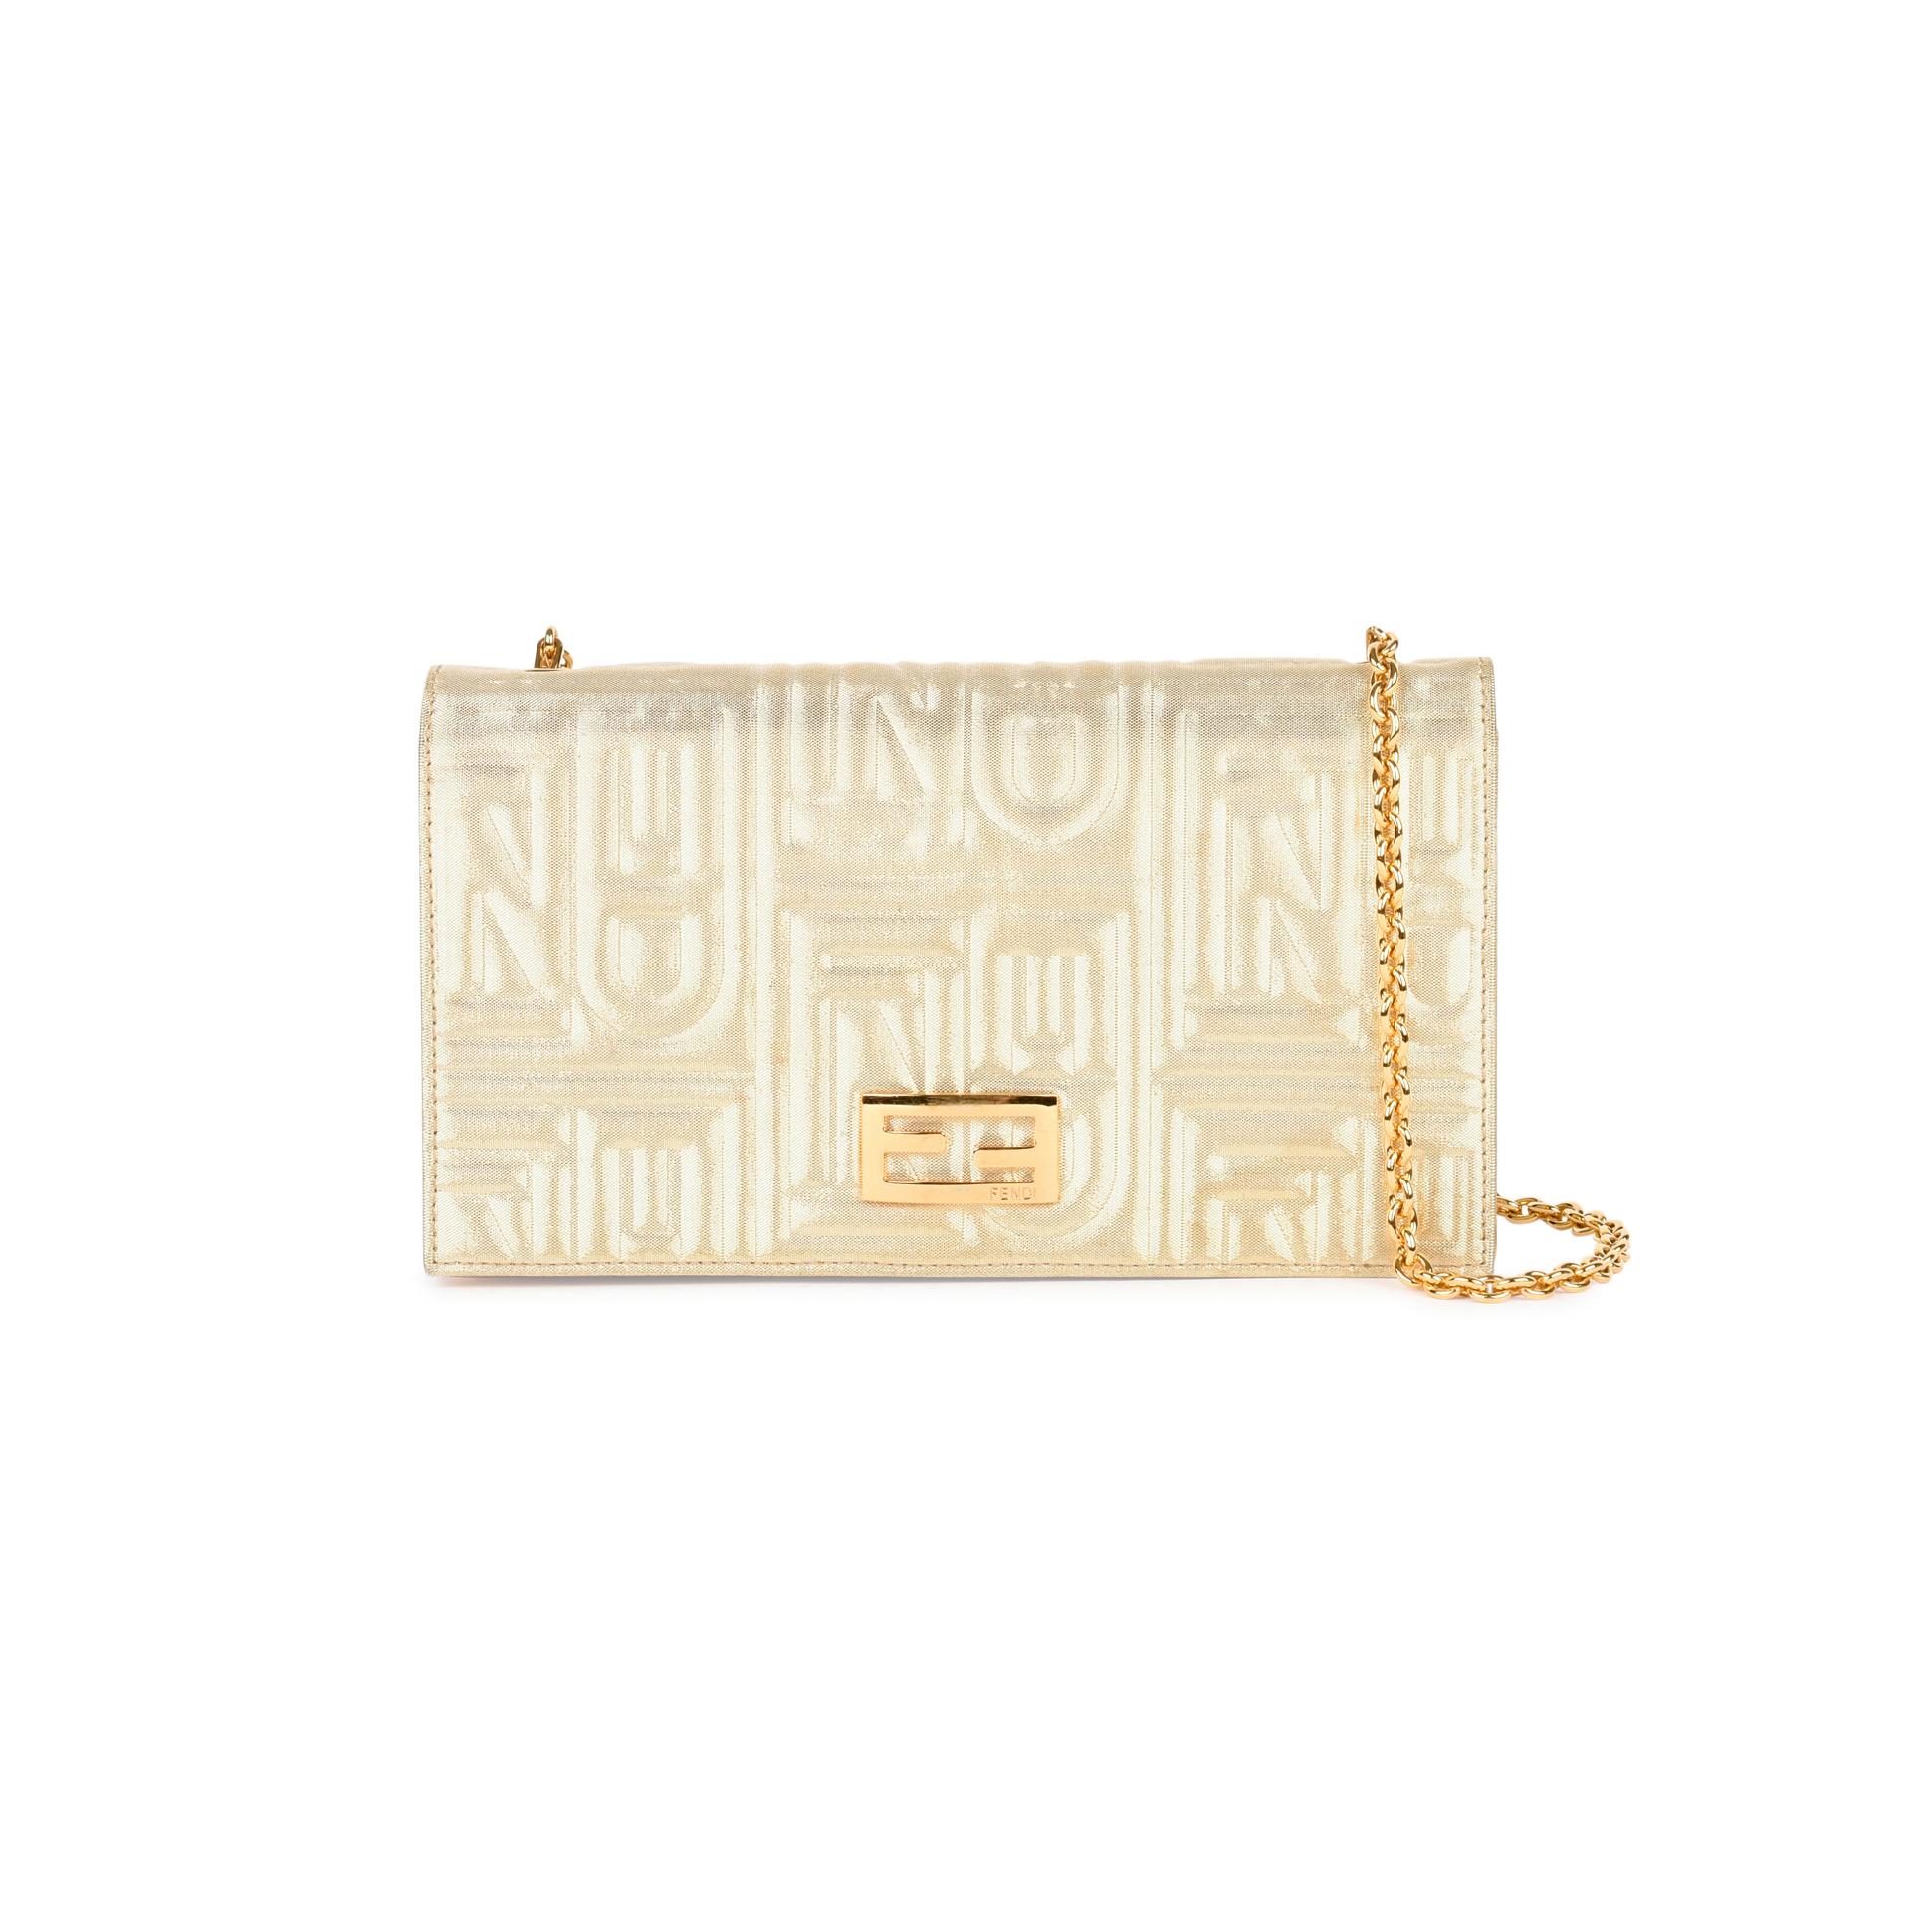 1036d2e6de74 Authentic Second Hand Fendi Embossed Wallet on Chain Bag (PSS-459-00004)